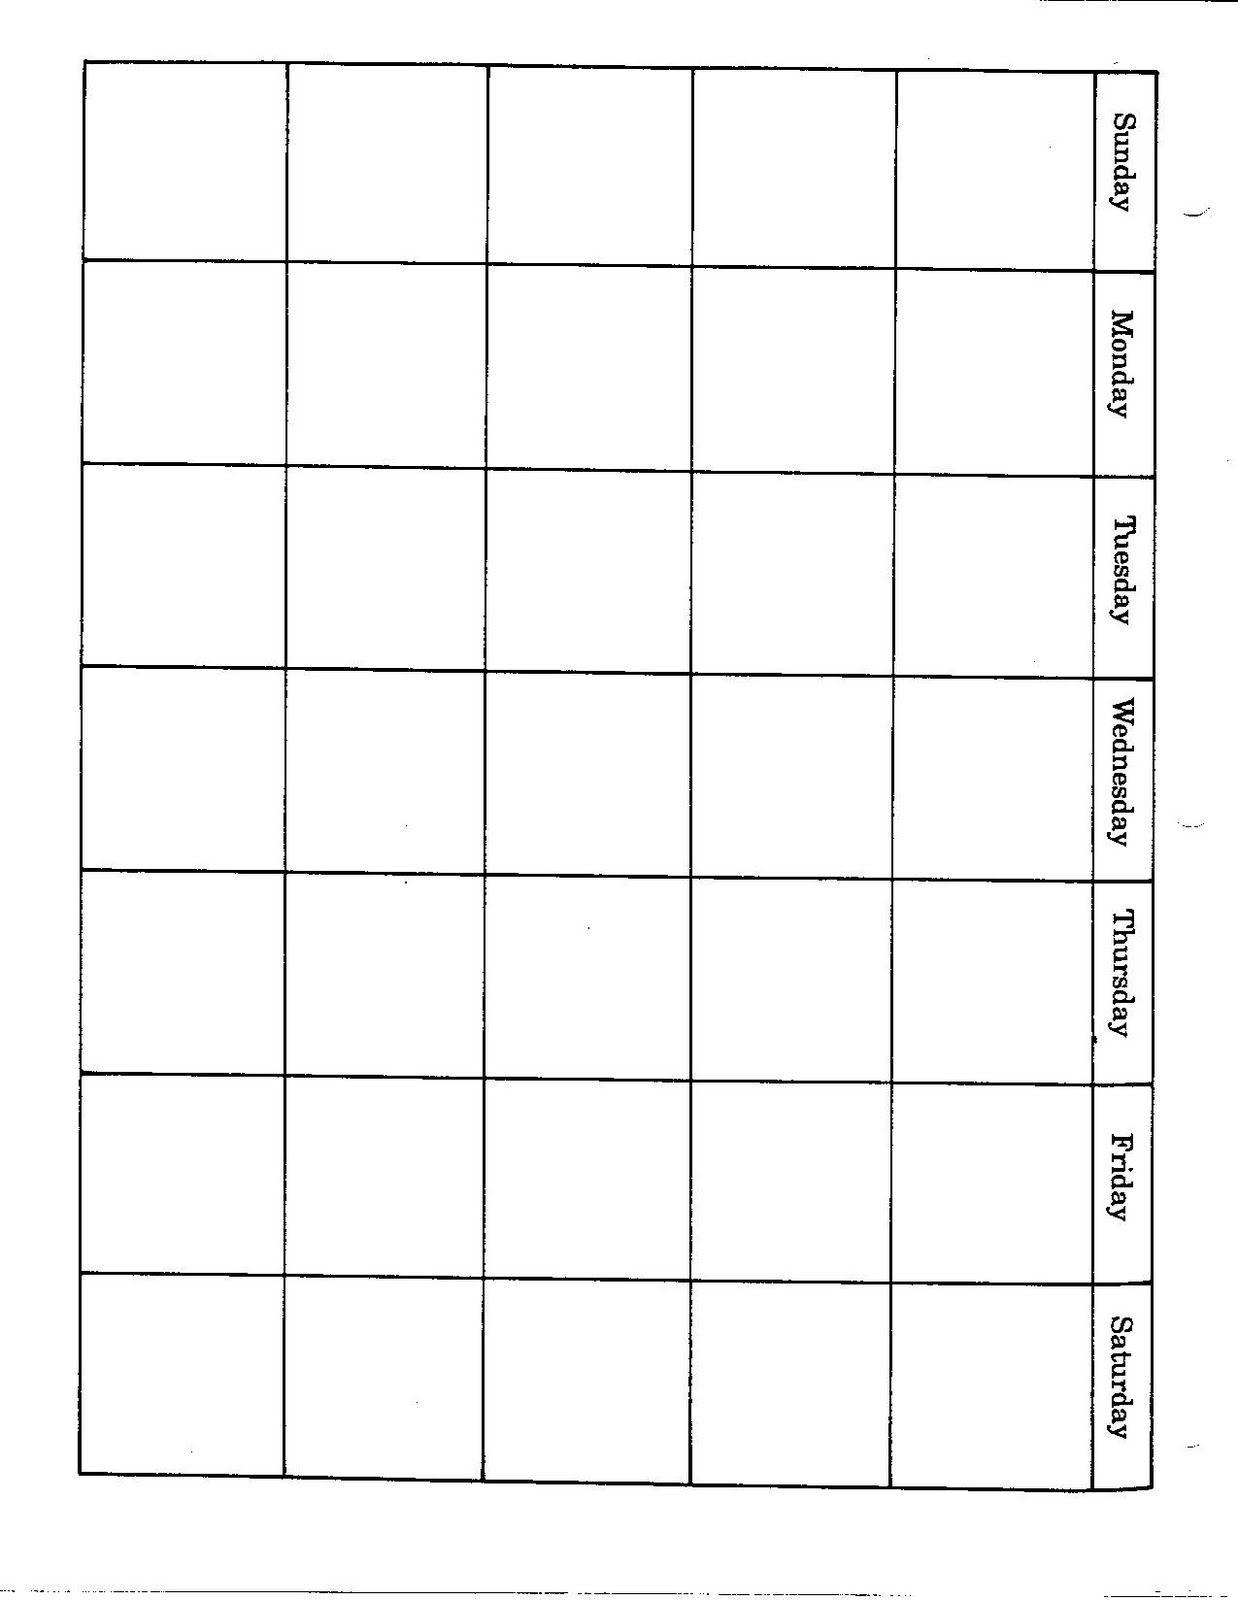 Blank Calendar Hd Wallpapers Download Free Blank Calendar Tumblr